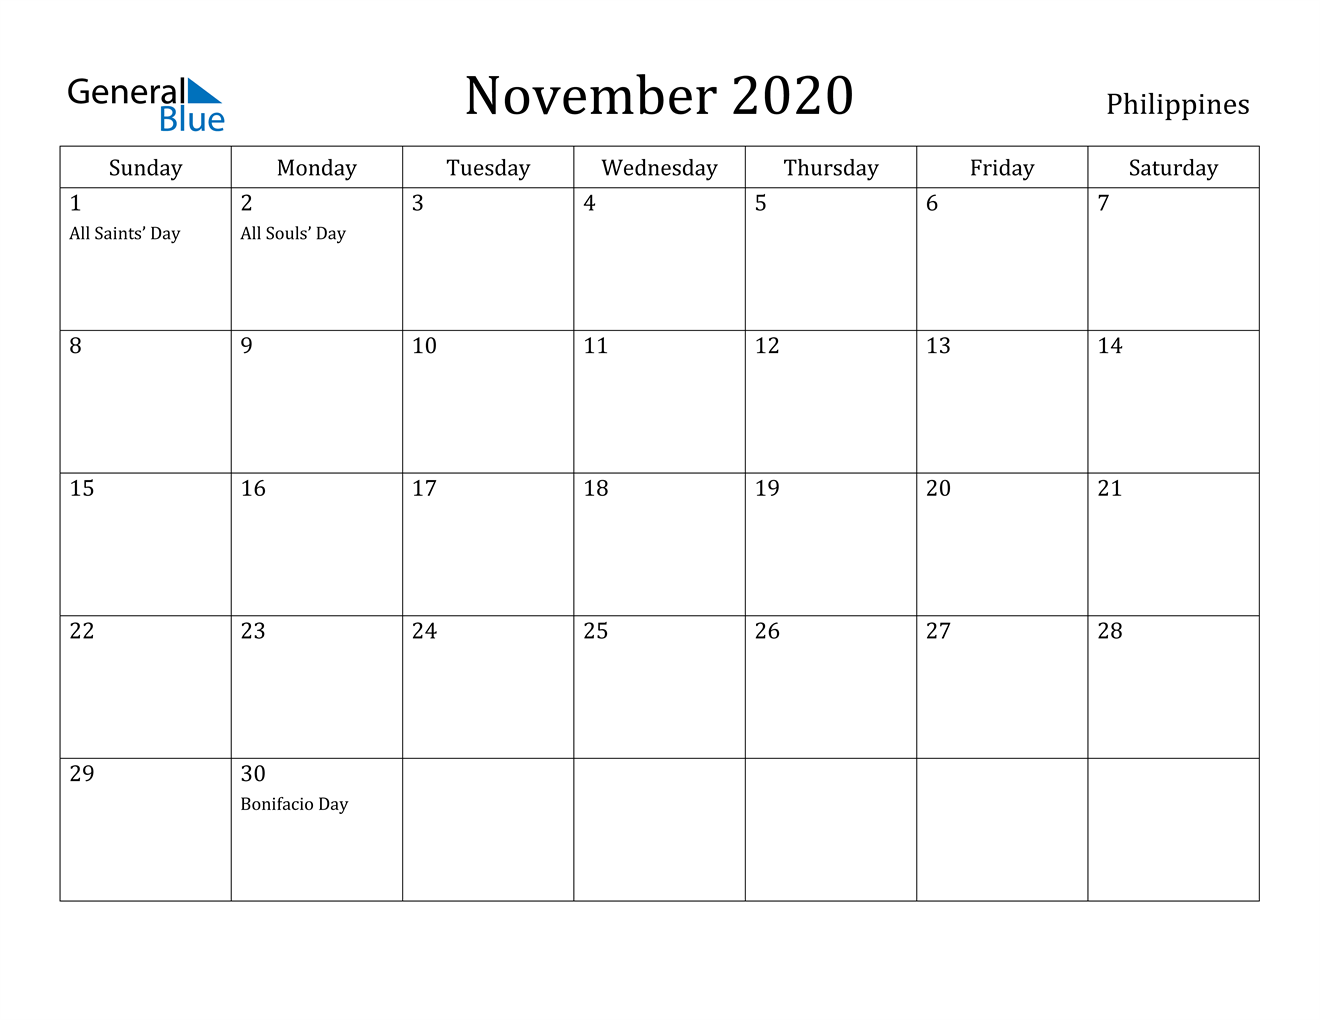 November 2020 Calendar - Philippines